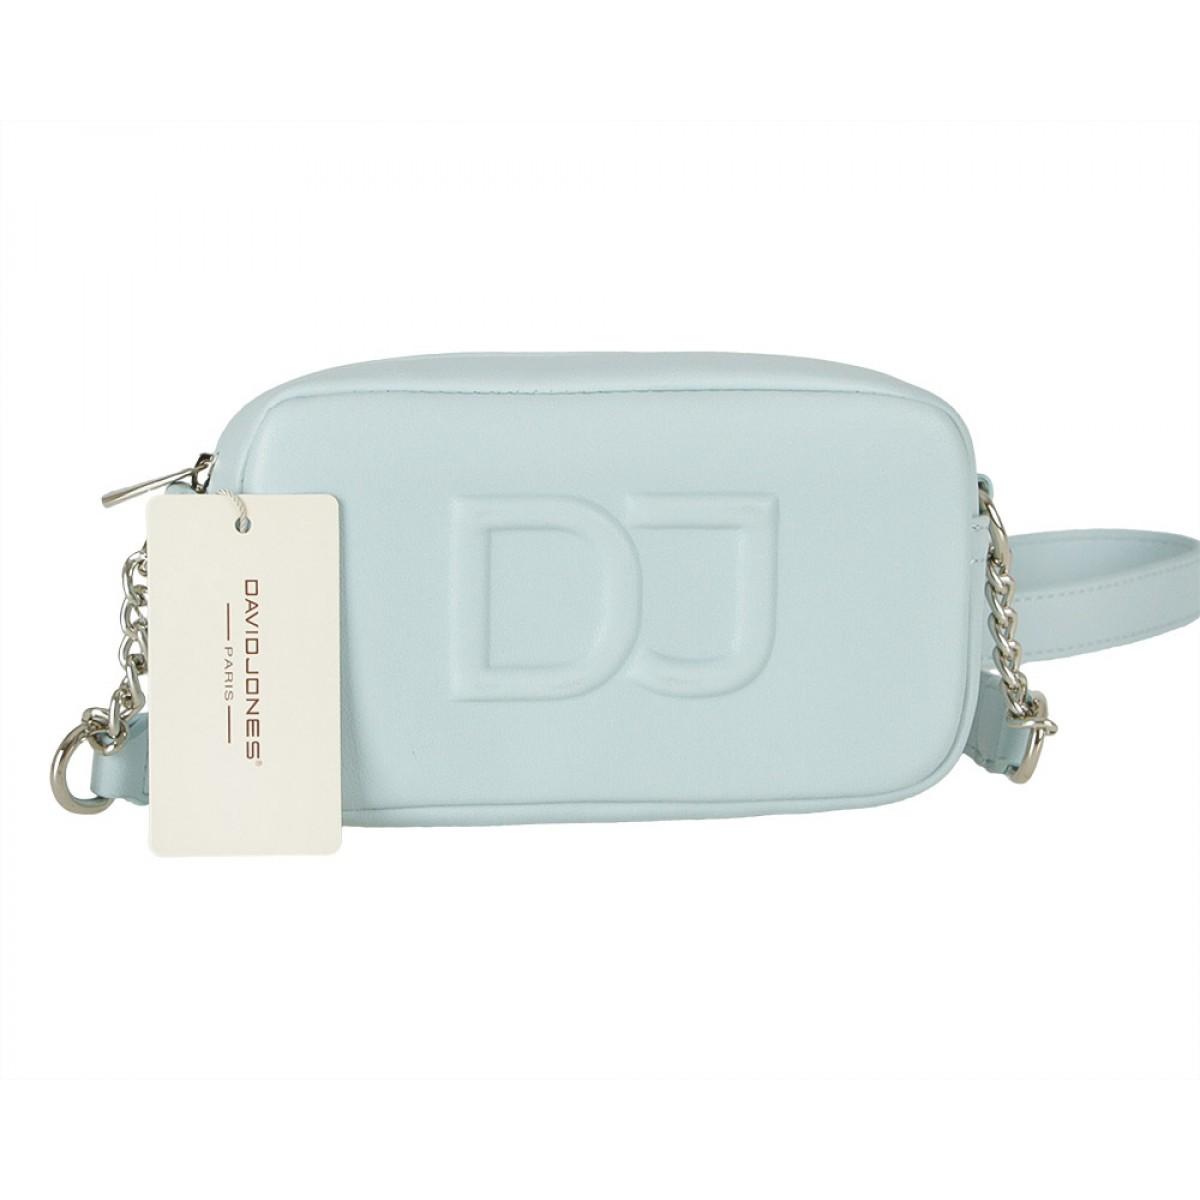 Жіноча сумка David Jones 6260-1 PALE BLUE